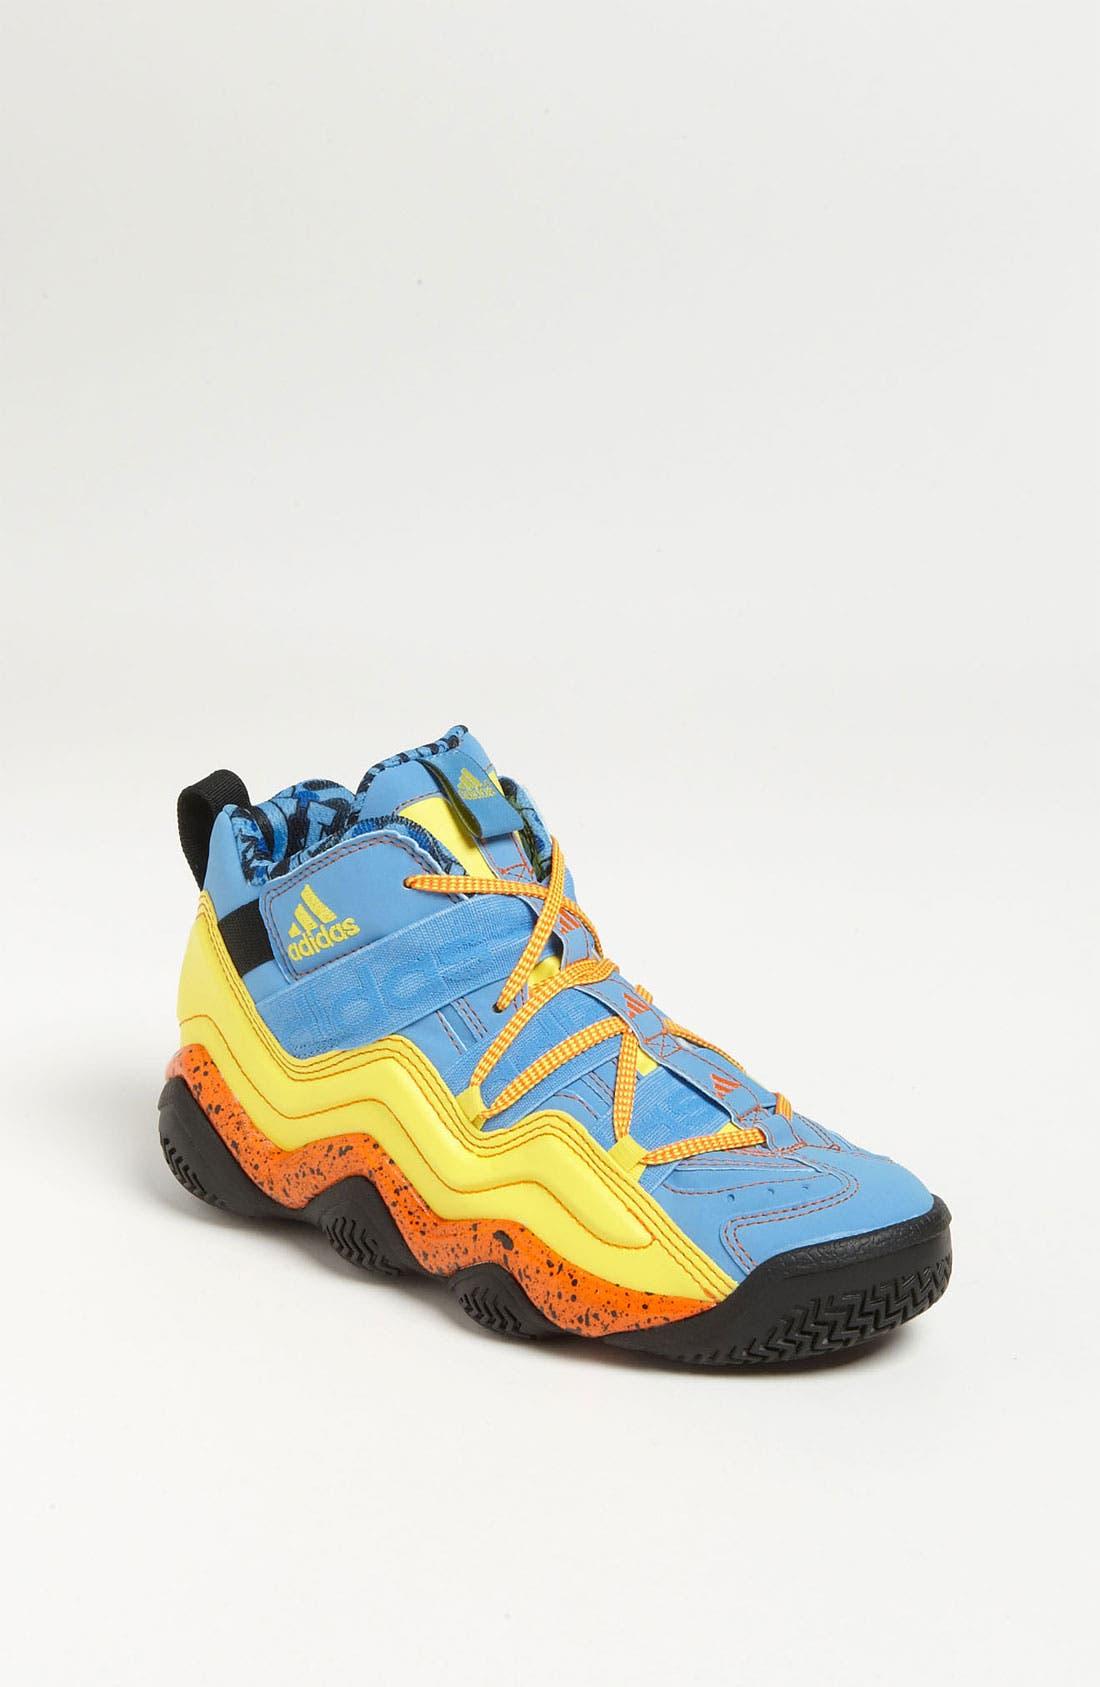 Alternate Image 1 Selected - adidas 'Top Ten 2000' Sneaker (Big Kid)